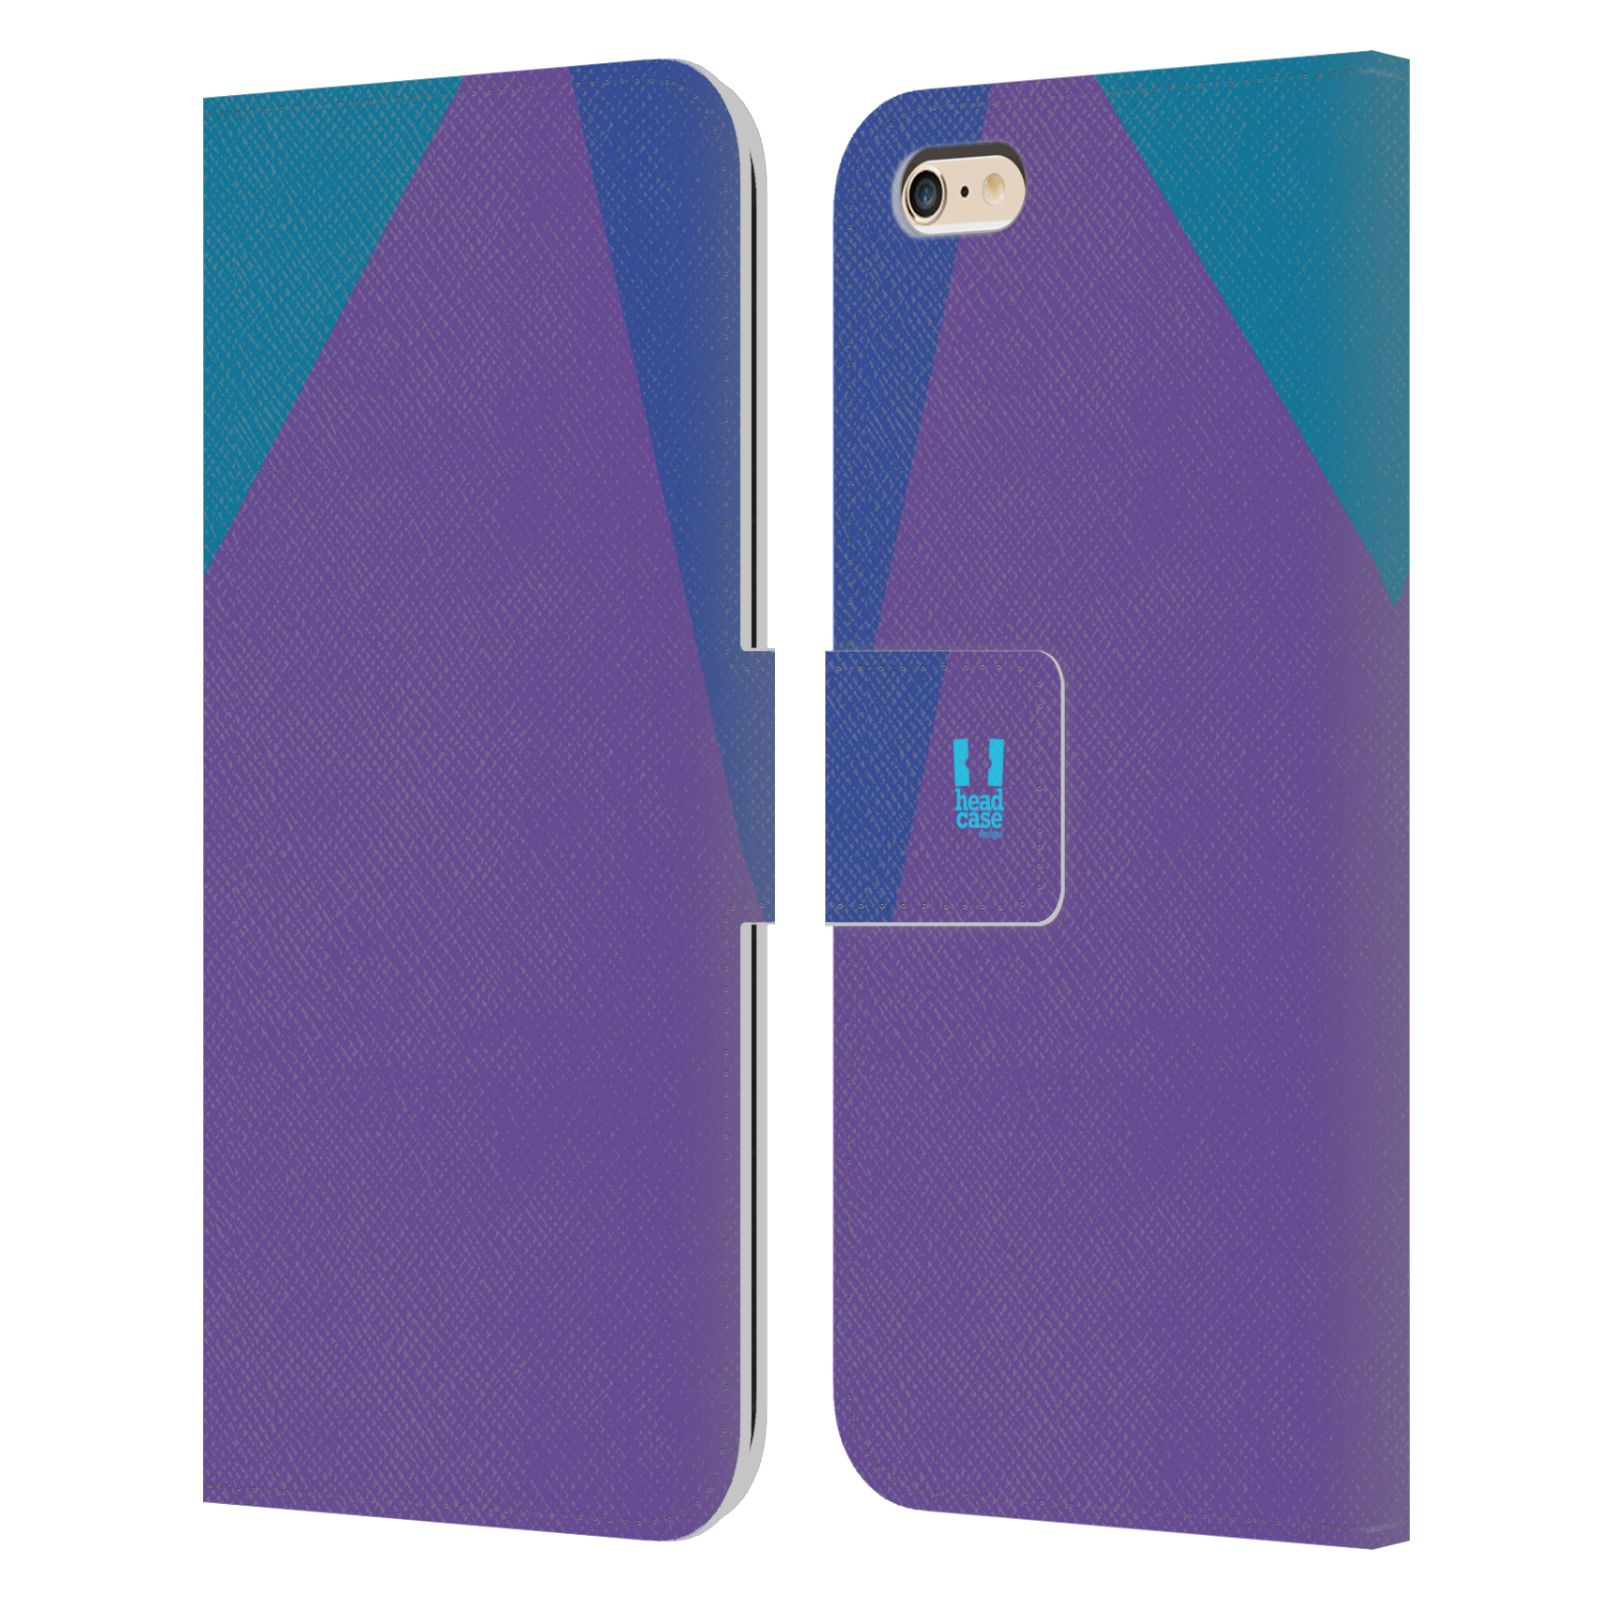 HEAD CASE Flipové pouzdro pro mobil Apple Iphone 6 PLUS/6S PLUS barevné tvary fialová feminine